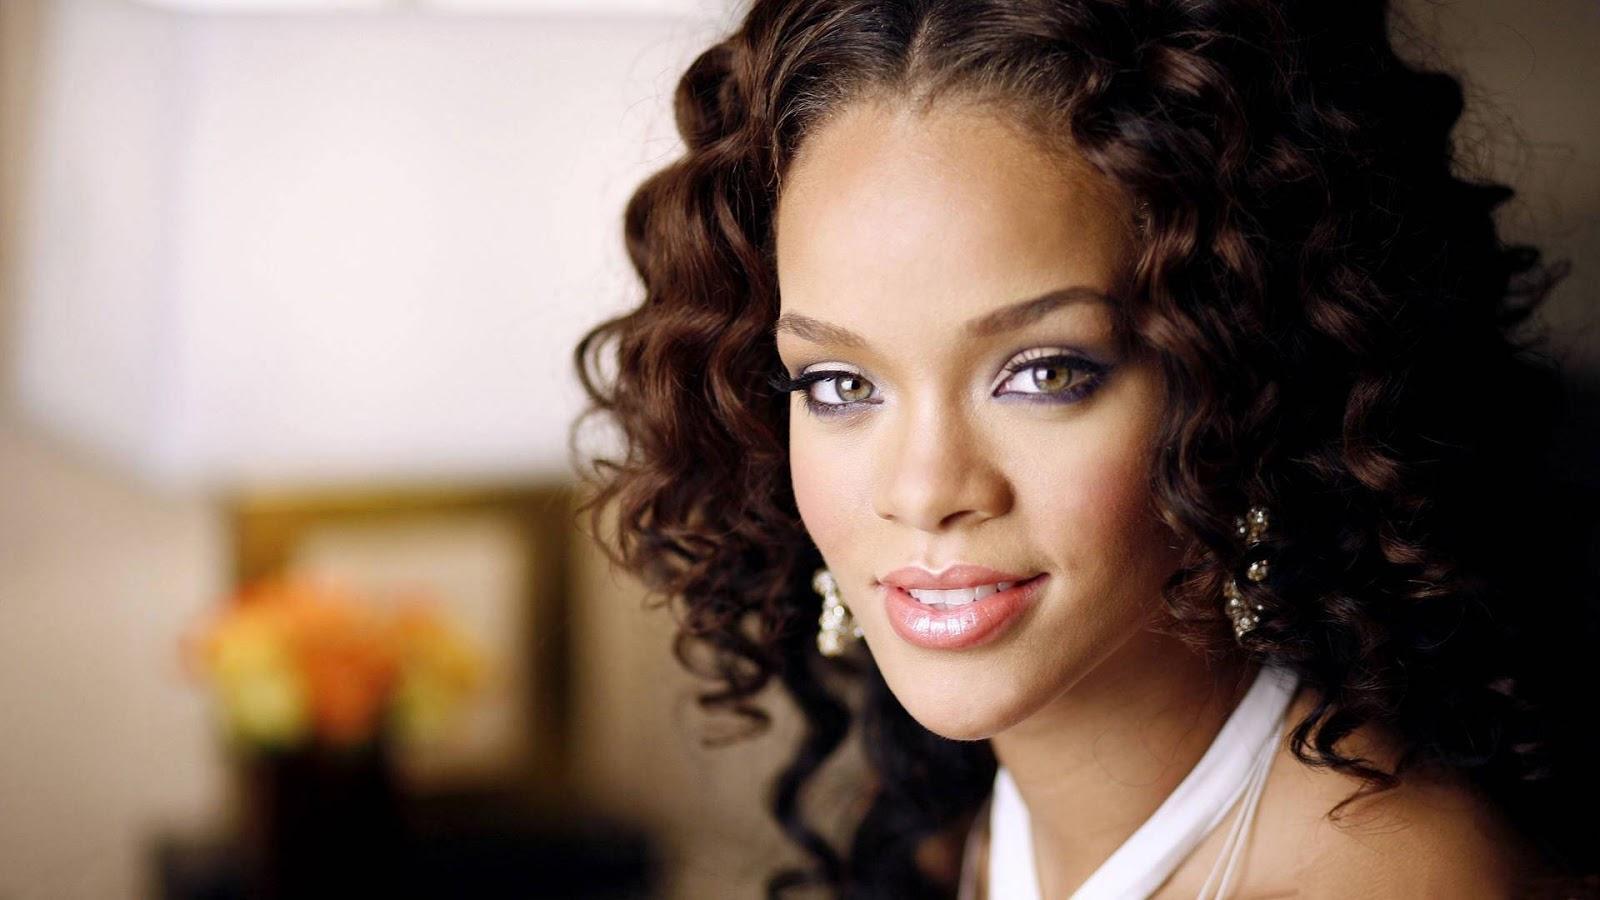 Rihanna: Rihana HD Wallpaper 2012 Free Download